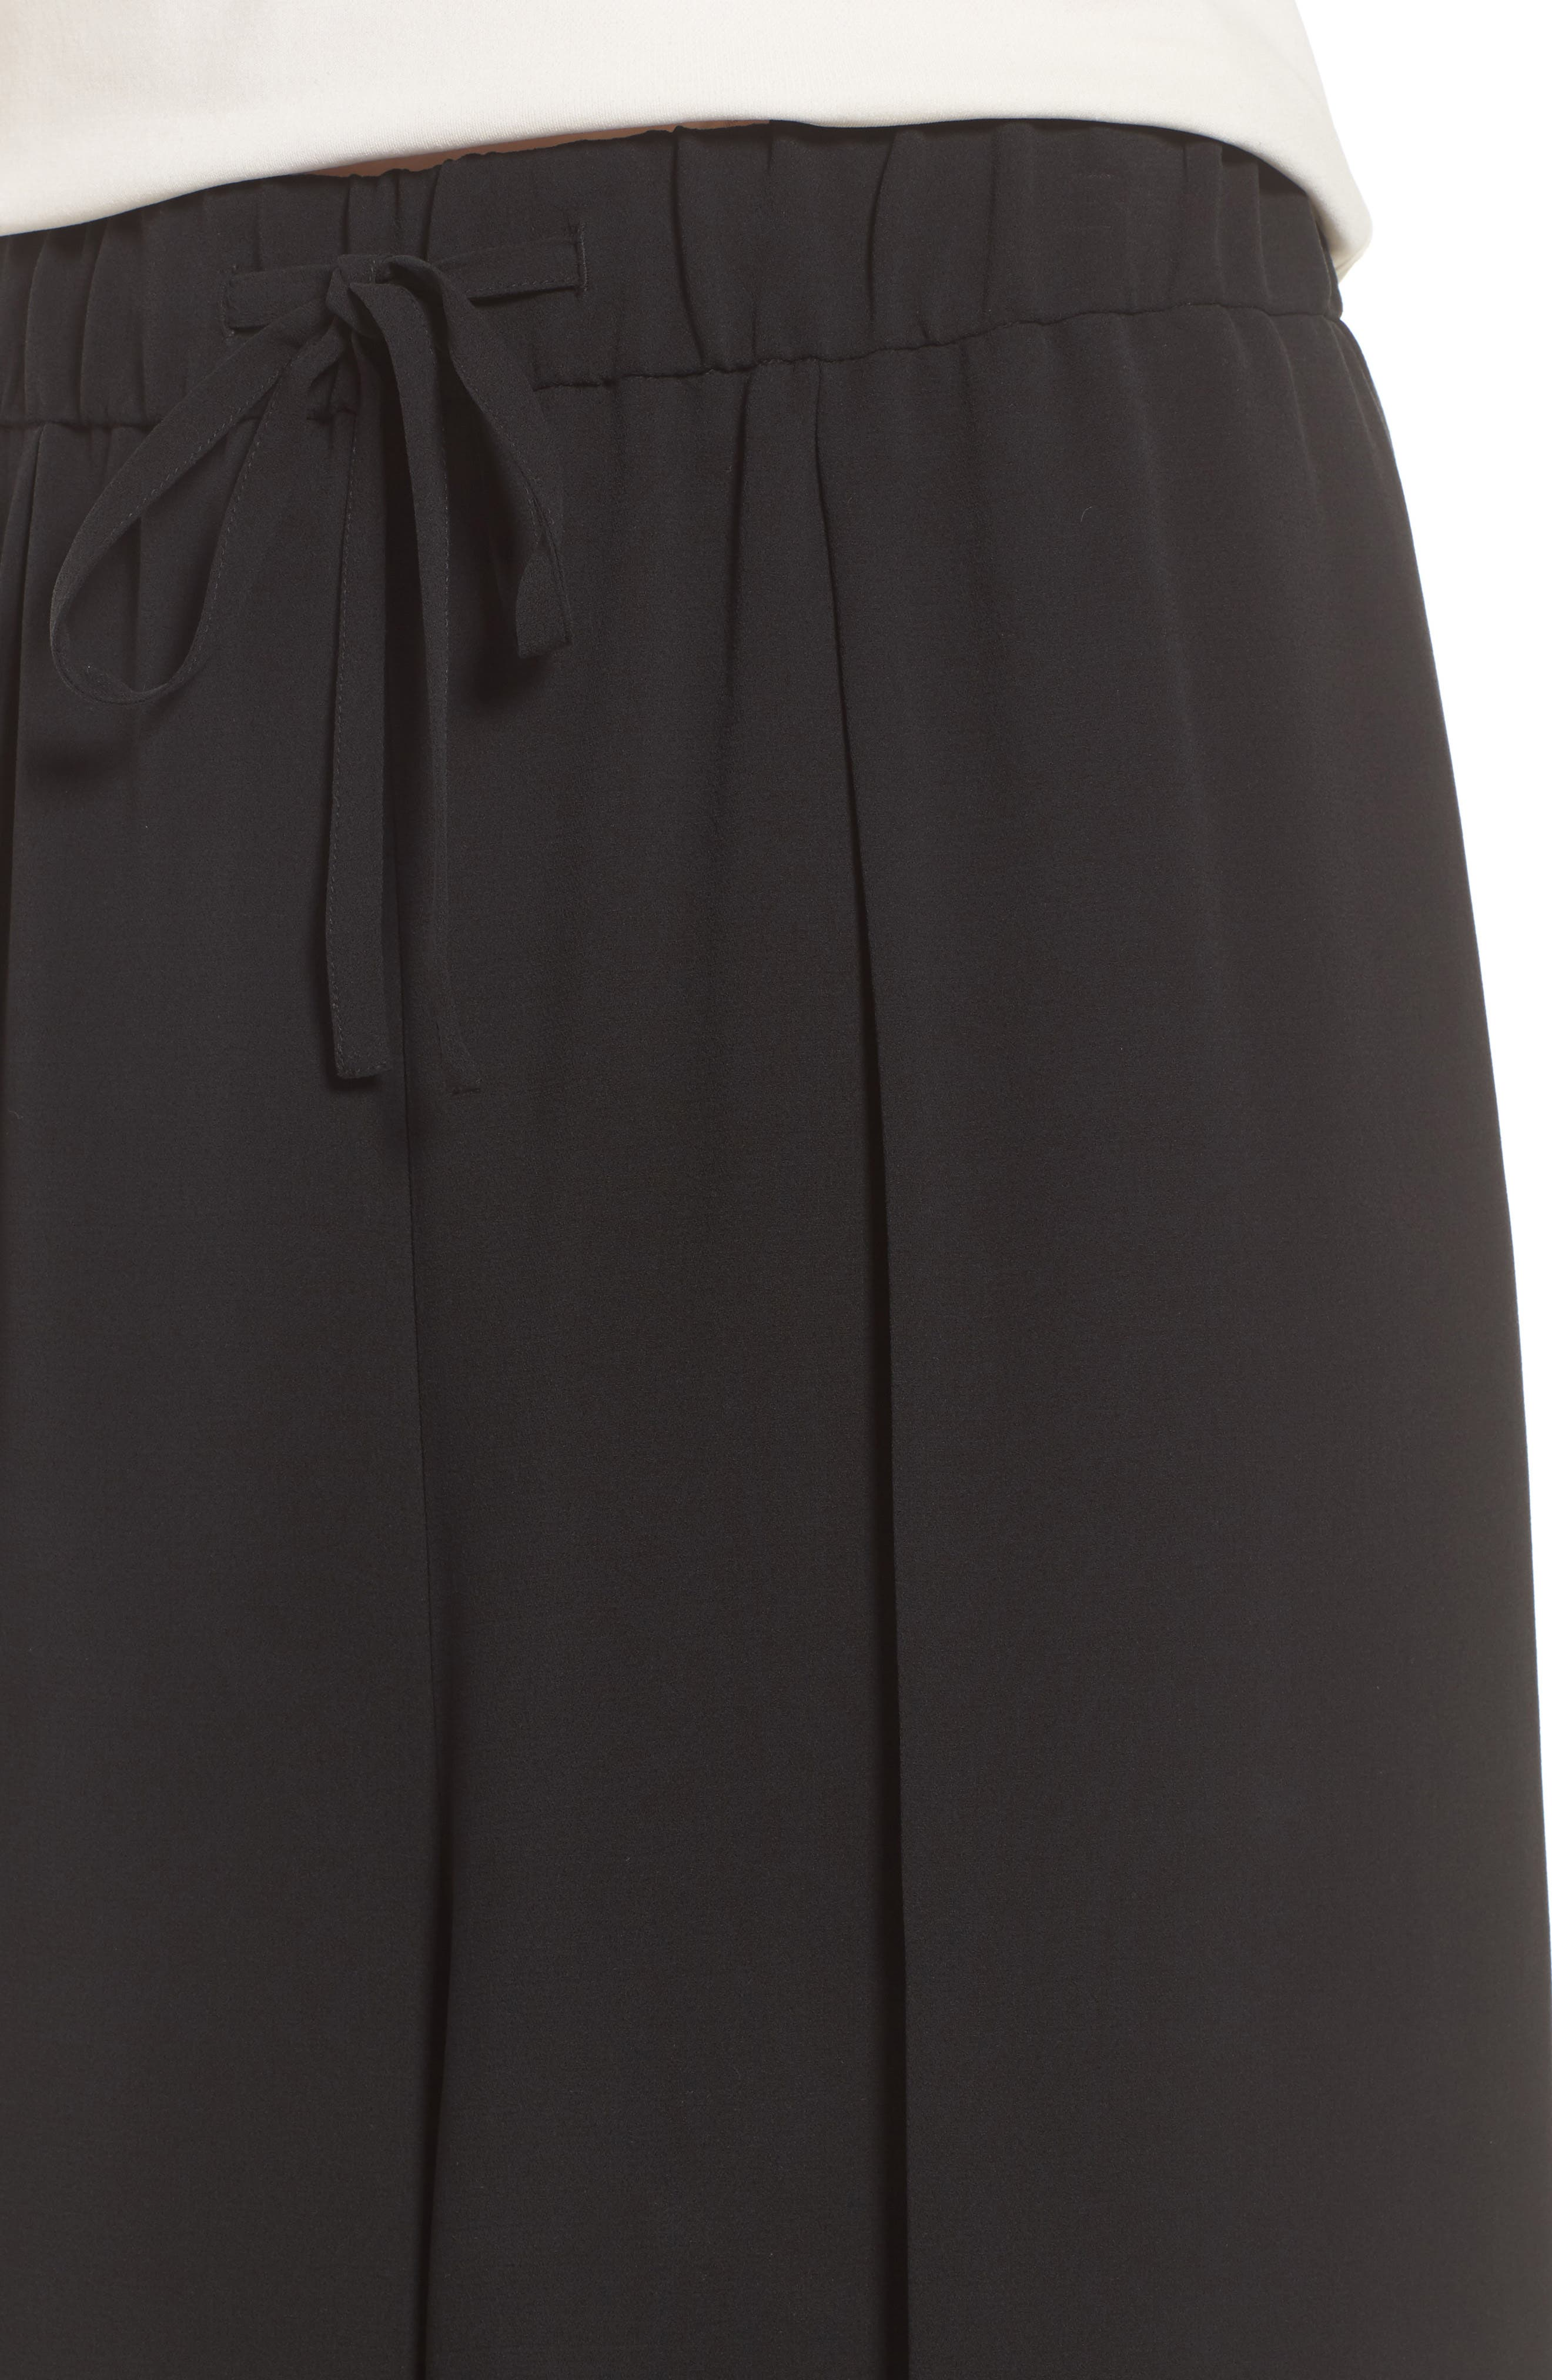 Crop Silk Pants,                             Alternate thumbnail 4, color,                             Black